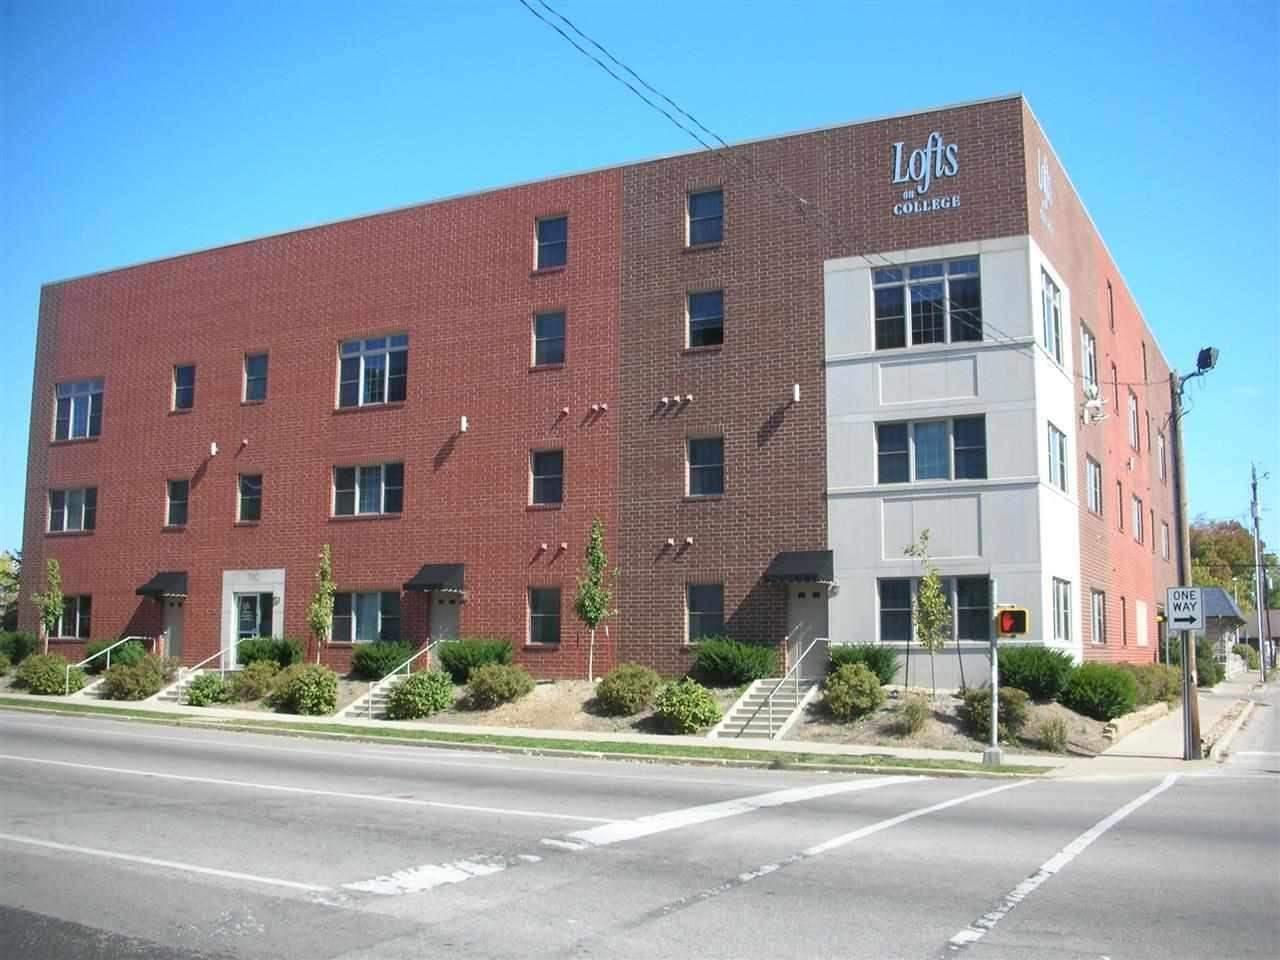 Rental Homes for Rent, ListingId:30256188, location: 702 N College Bloomington 47404